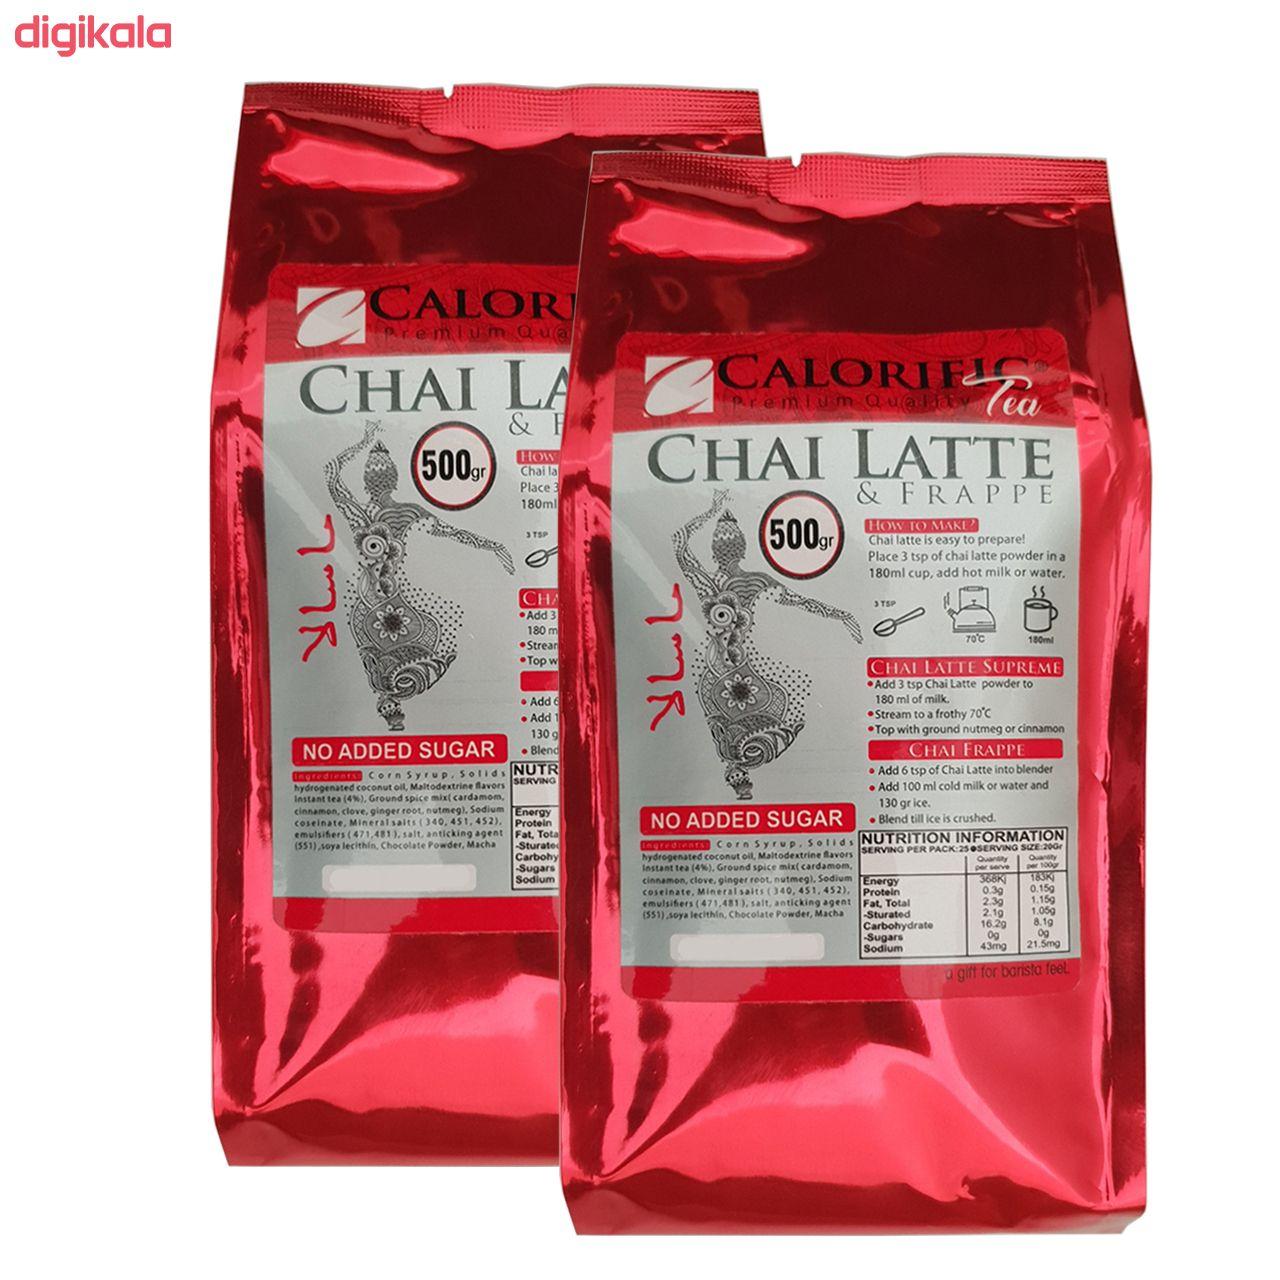 چای ماسالا کالروفیک - 500 گرم main 1 1